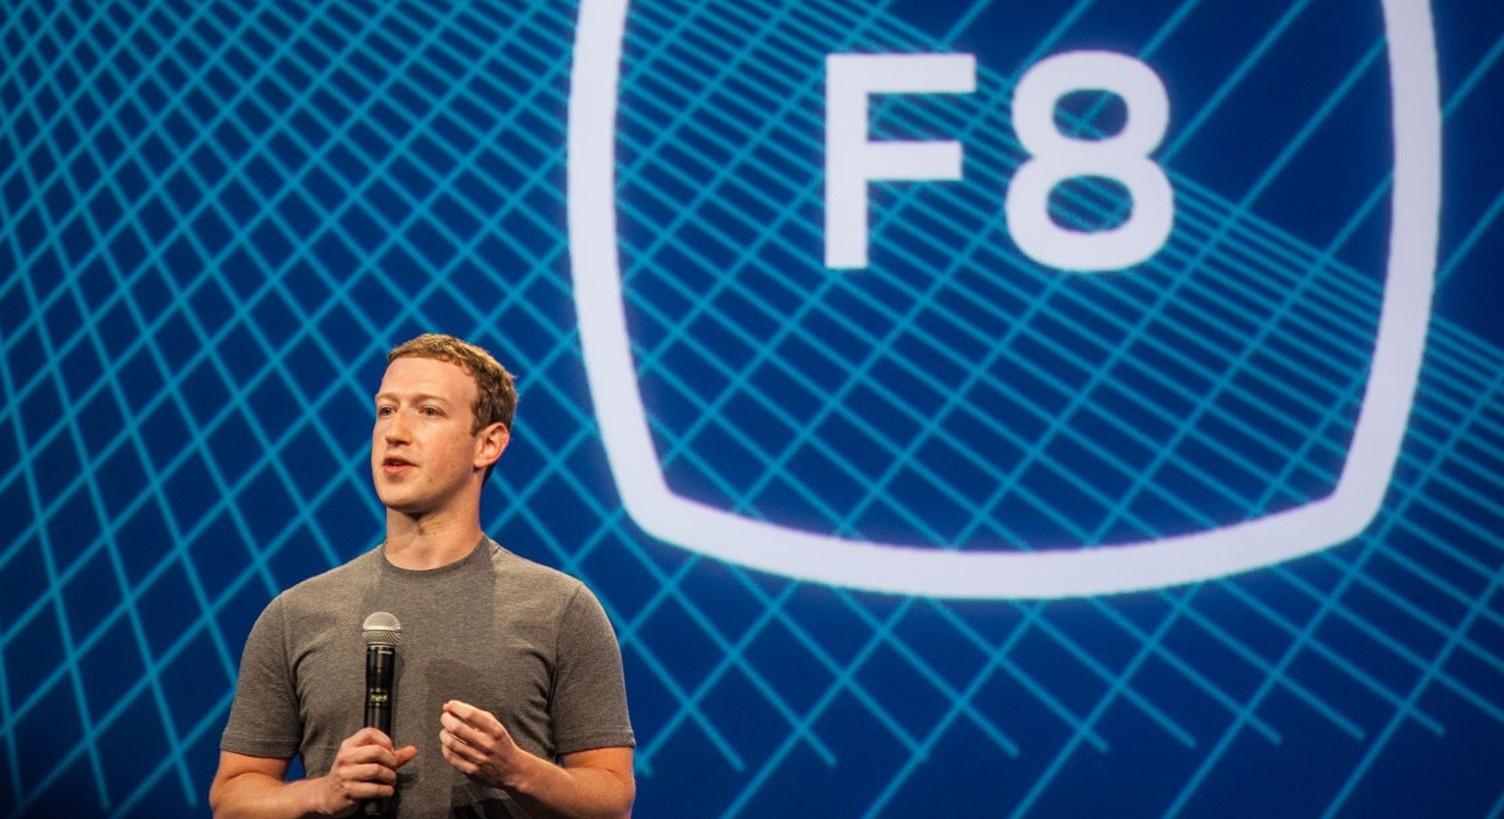 Facebook F8 Conference 2016: Virtual Reality, Virtual Selfie Sticks, Gigabit Speeds, Messenger and More